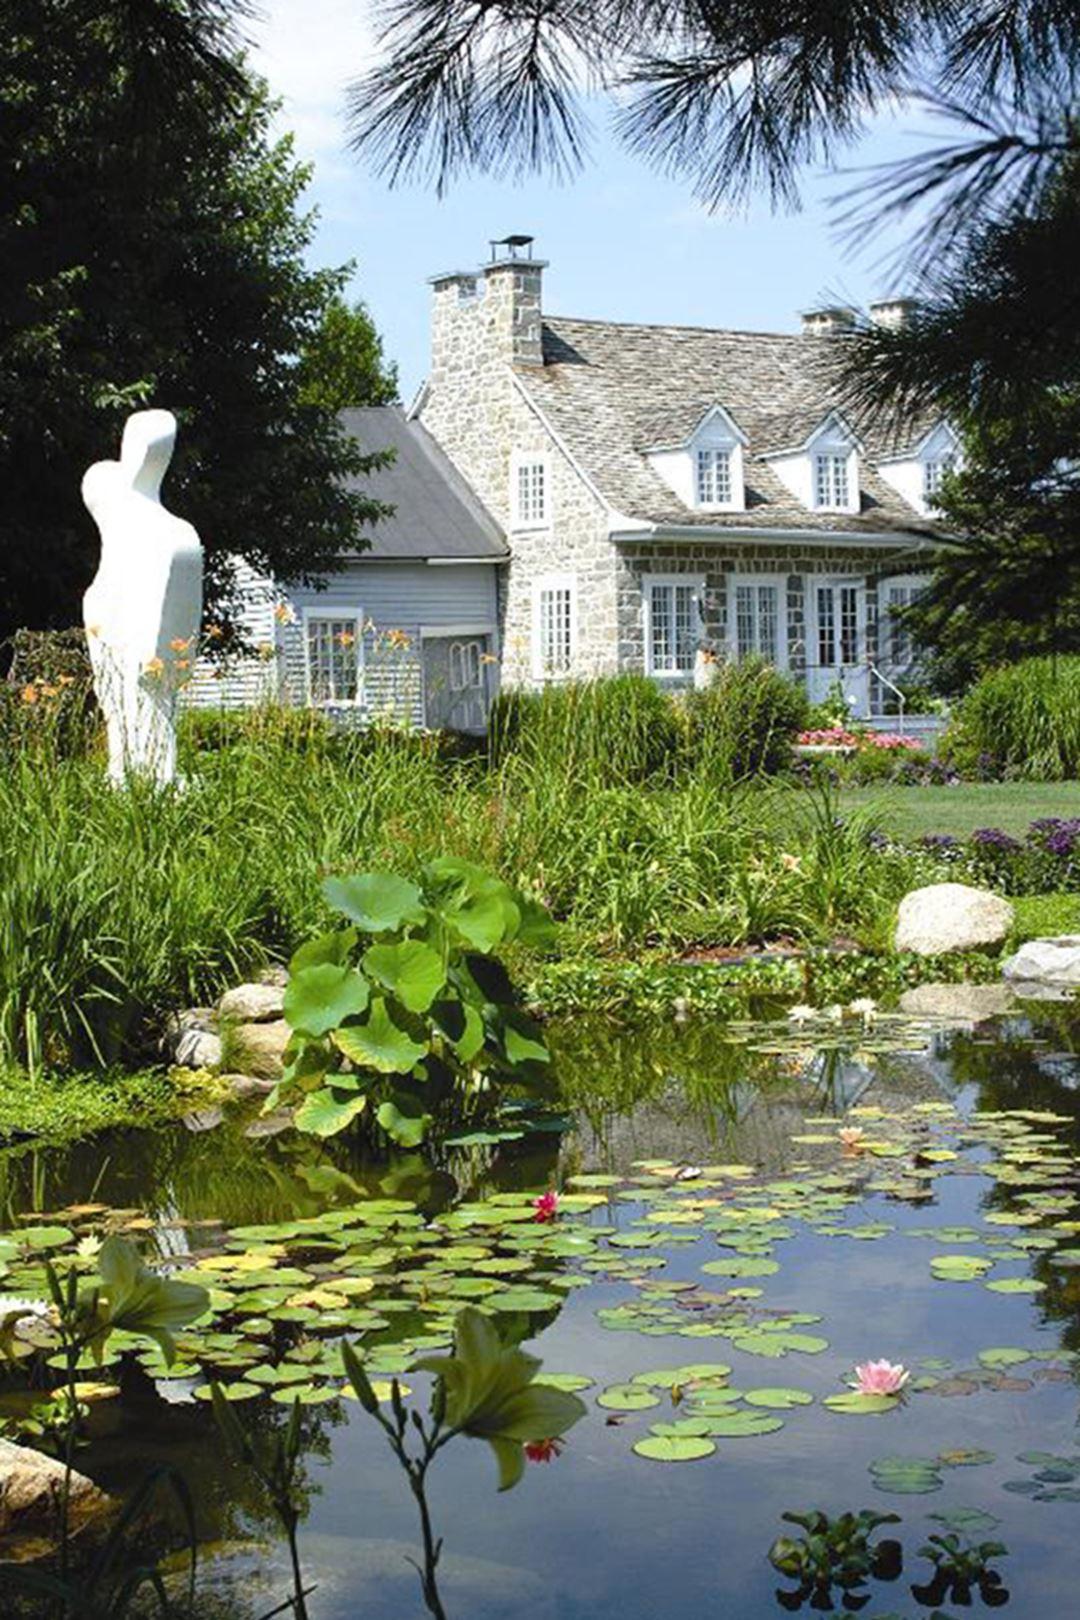 Maison et jardins Antoine-Lacombe